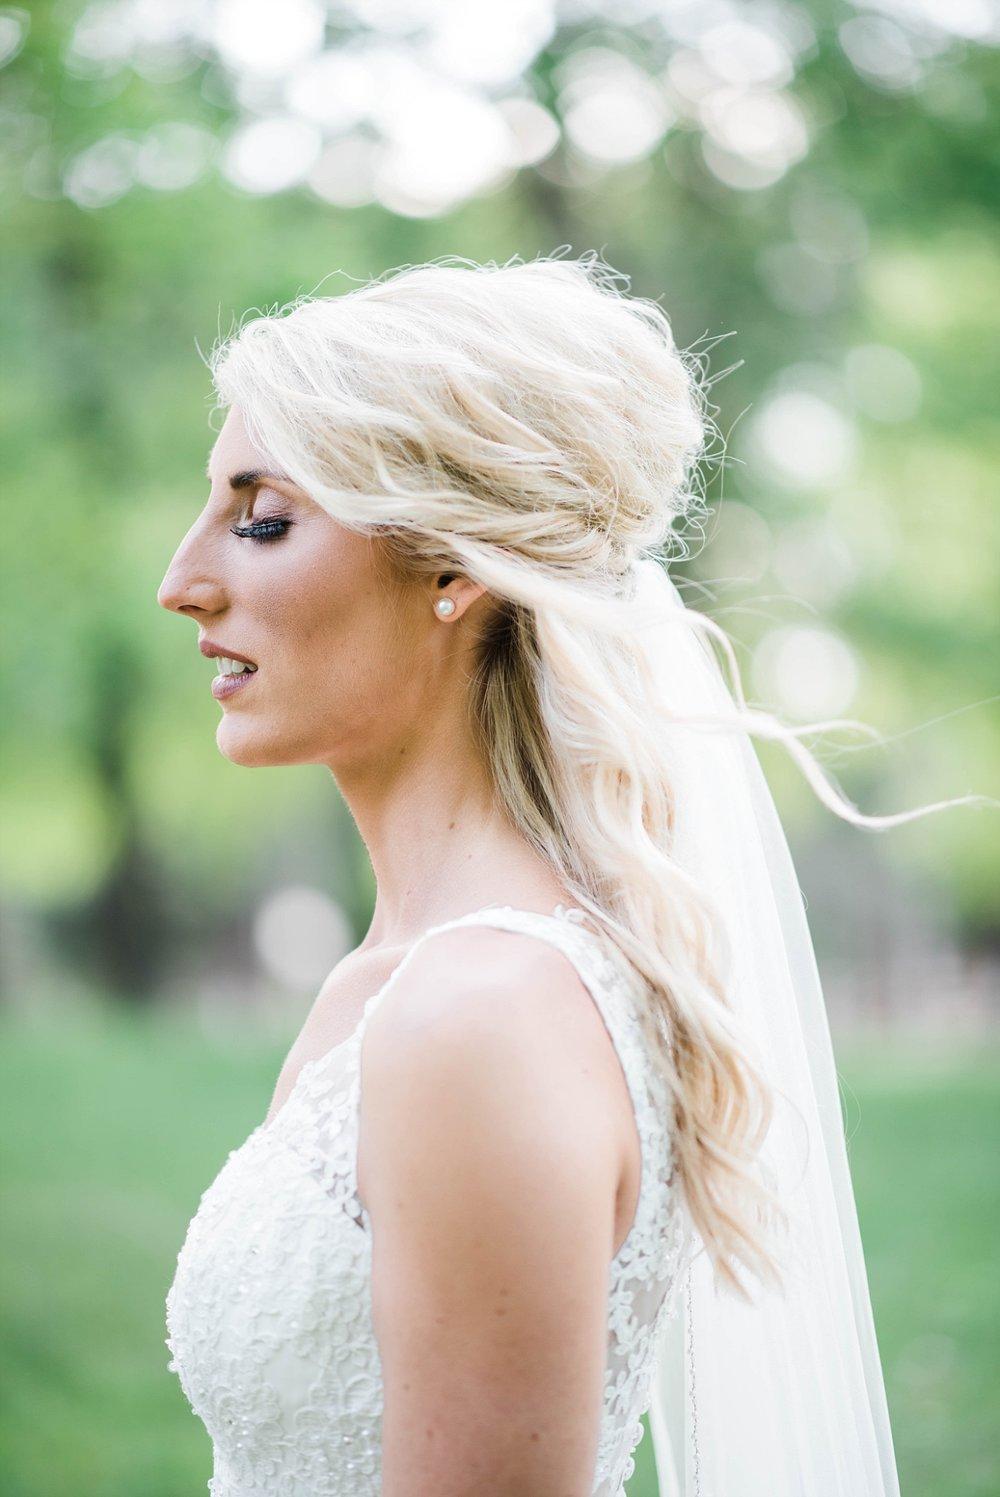 BRIDALPORTRAITS | BRIDE WITH VEIL| ELEGANT SPRING WEDDING AT THE SONNET HOUSE | TJ & SHELBY | JOHNSON WEDDING